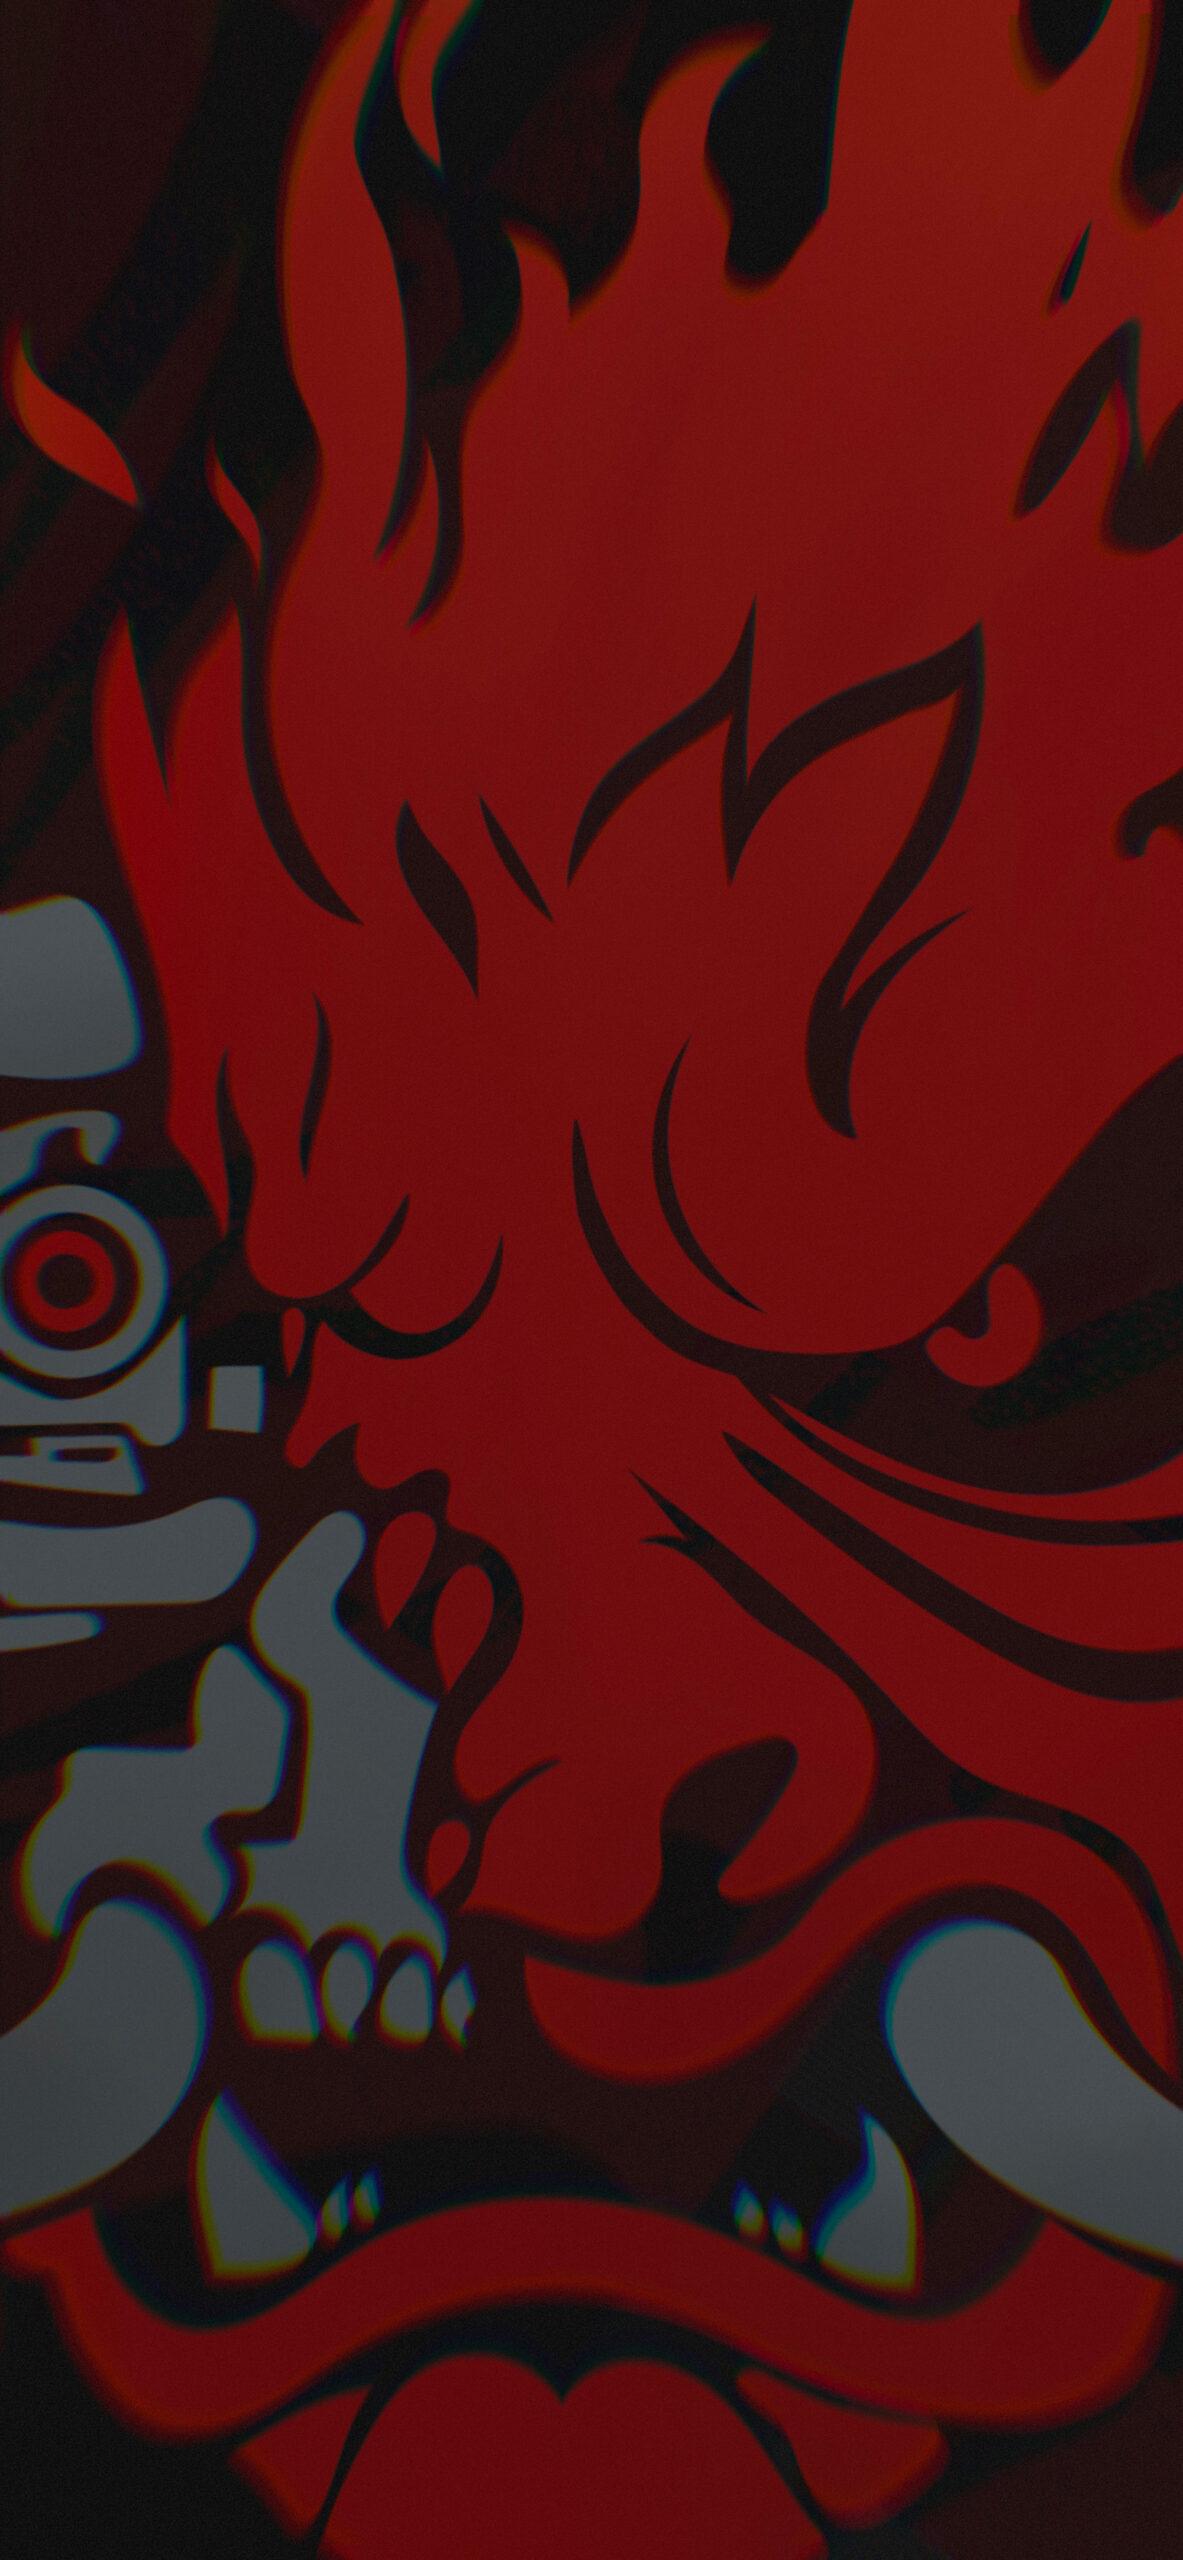 cyberpunk 2077 samurai logo black background